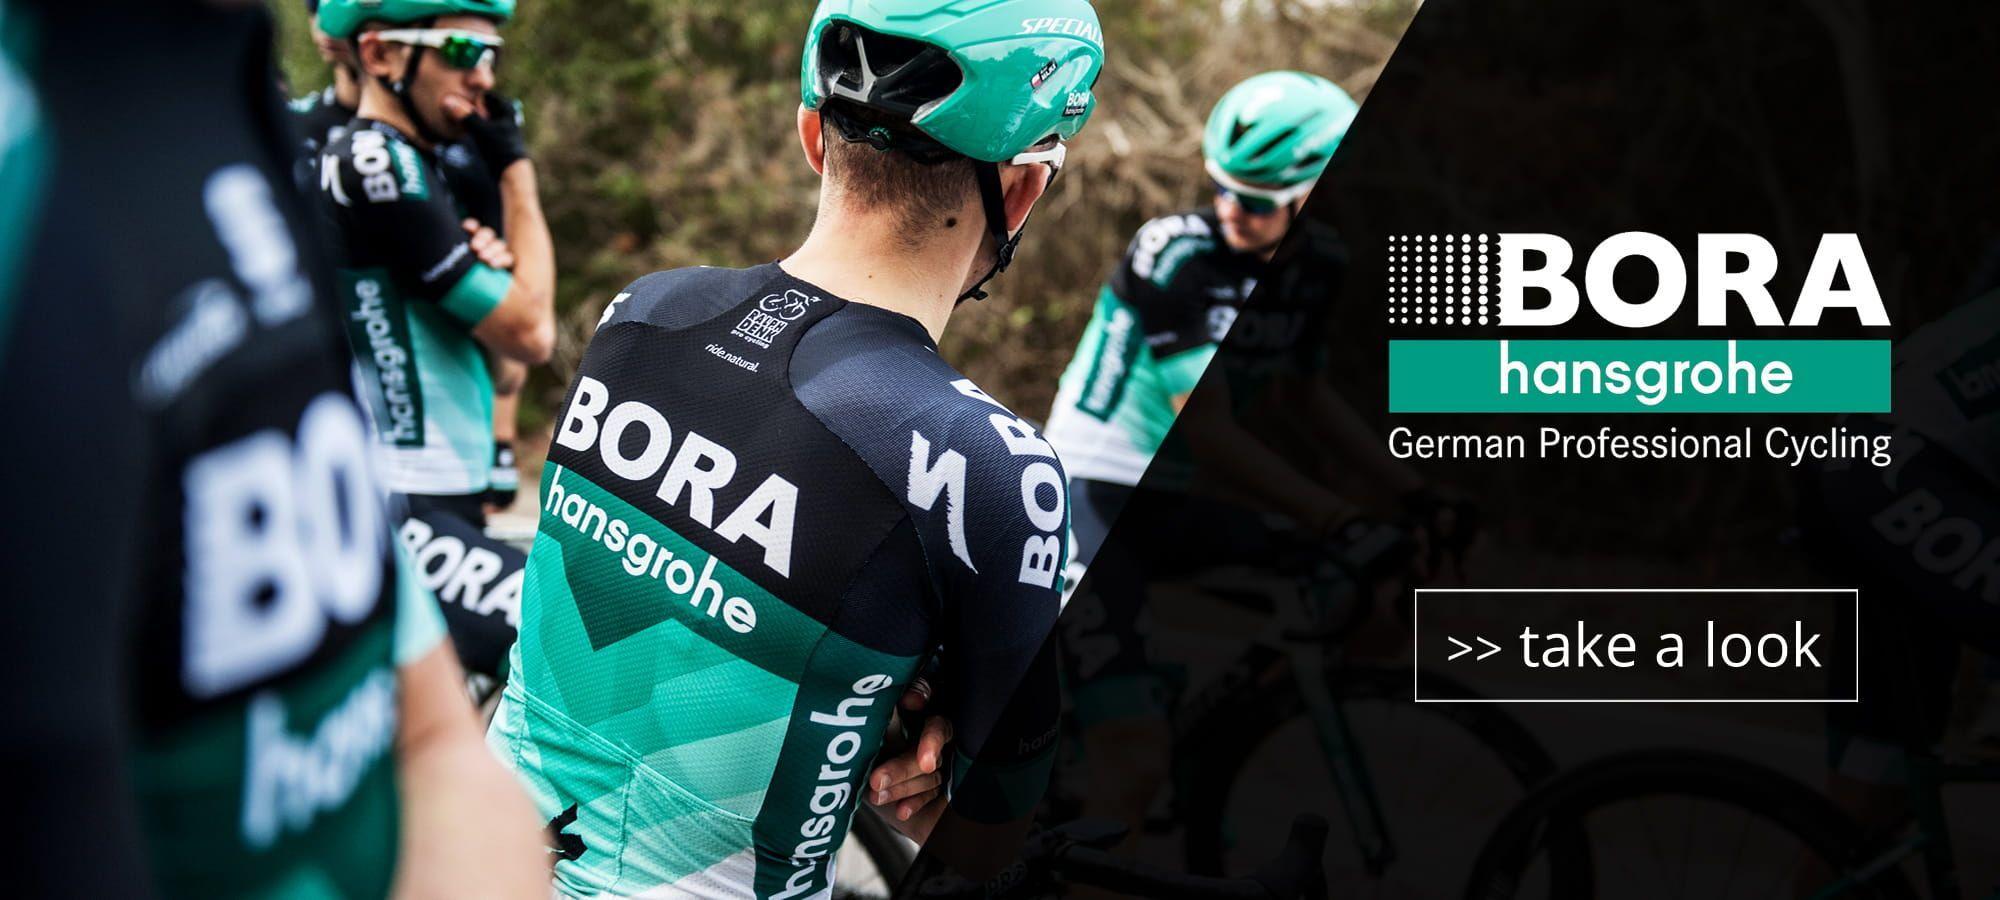 Bora Hansgrohe 2018 - German professional cycling team